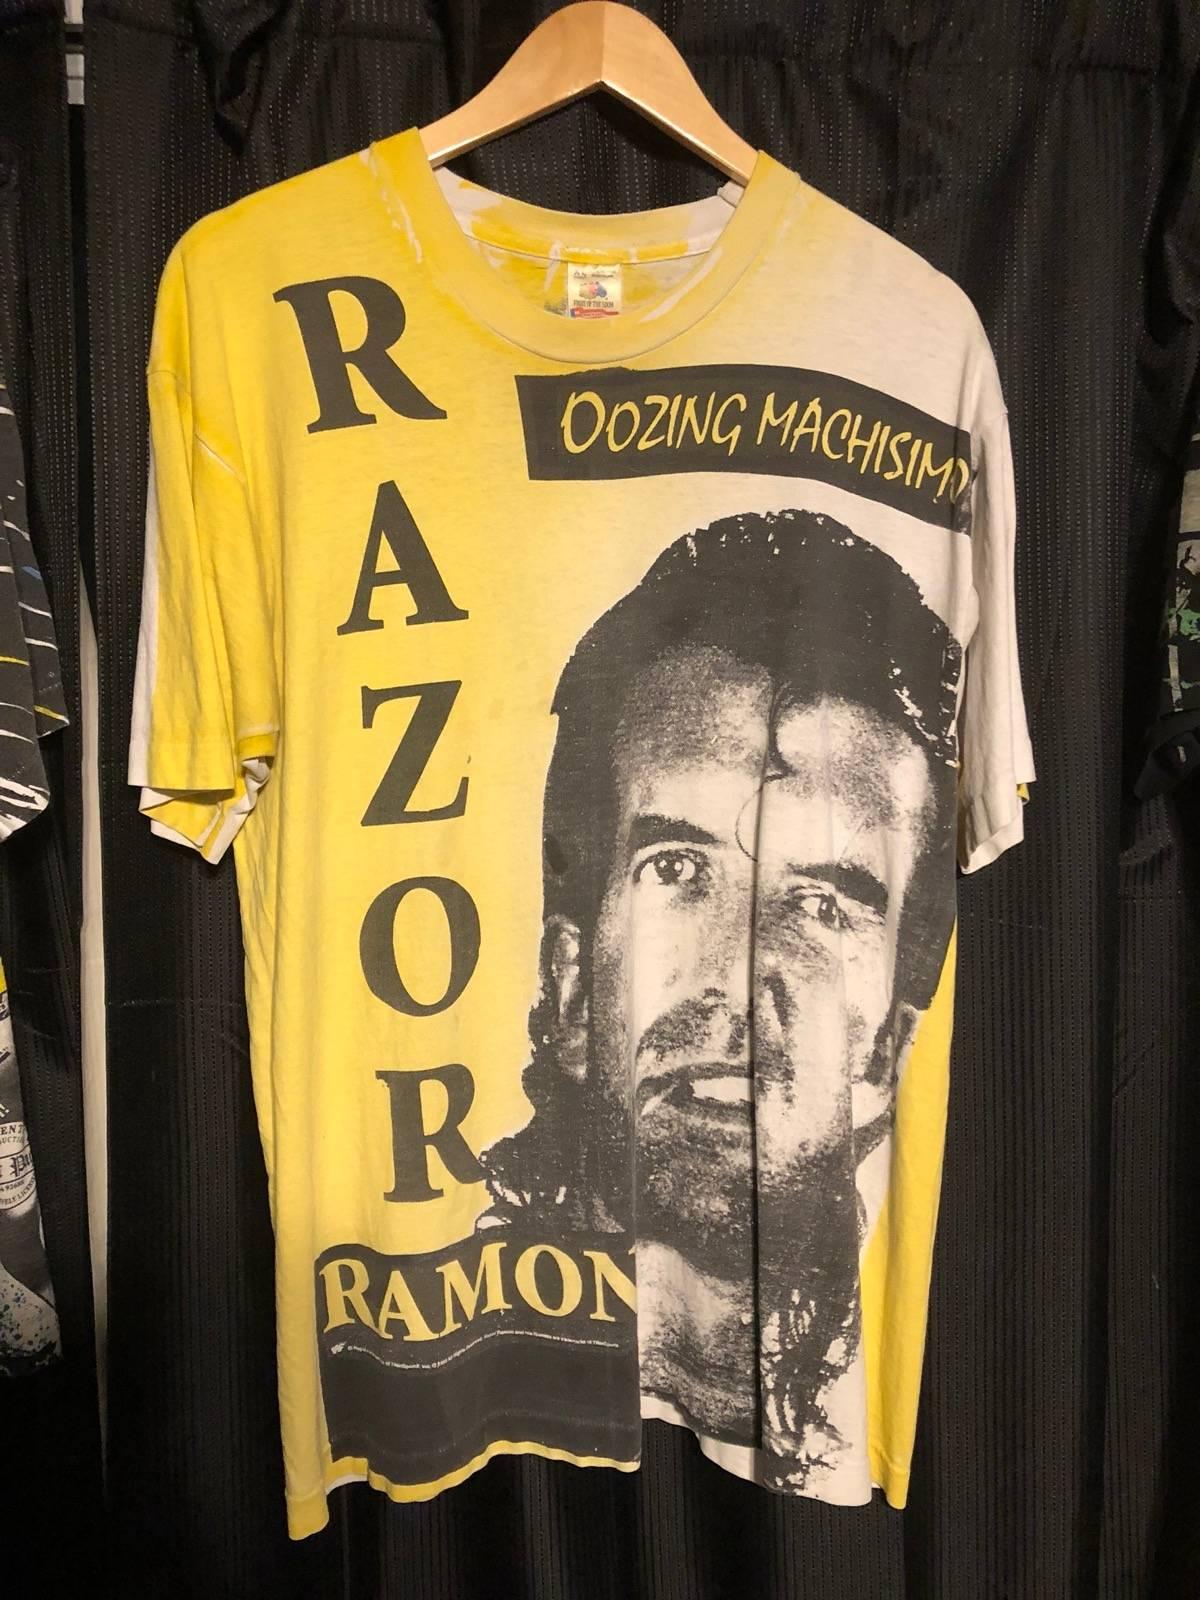 "Official WWE Authentic Razor Ramon /""Oozing Machismo/"" Retro T-Shirt Yellow Small"